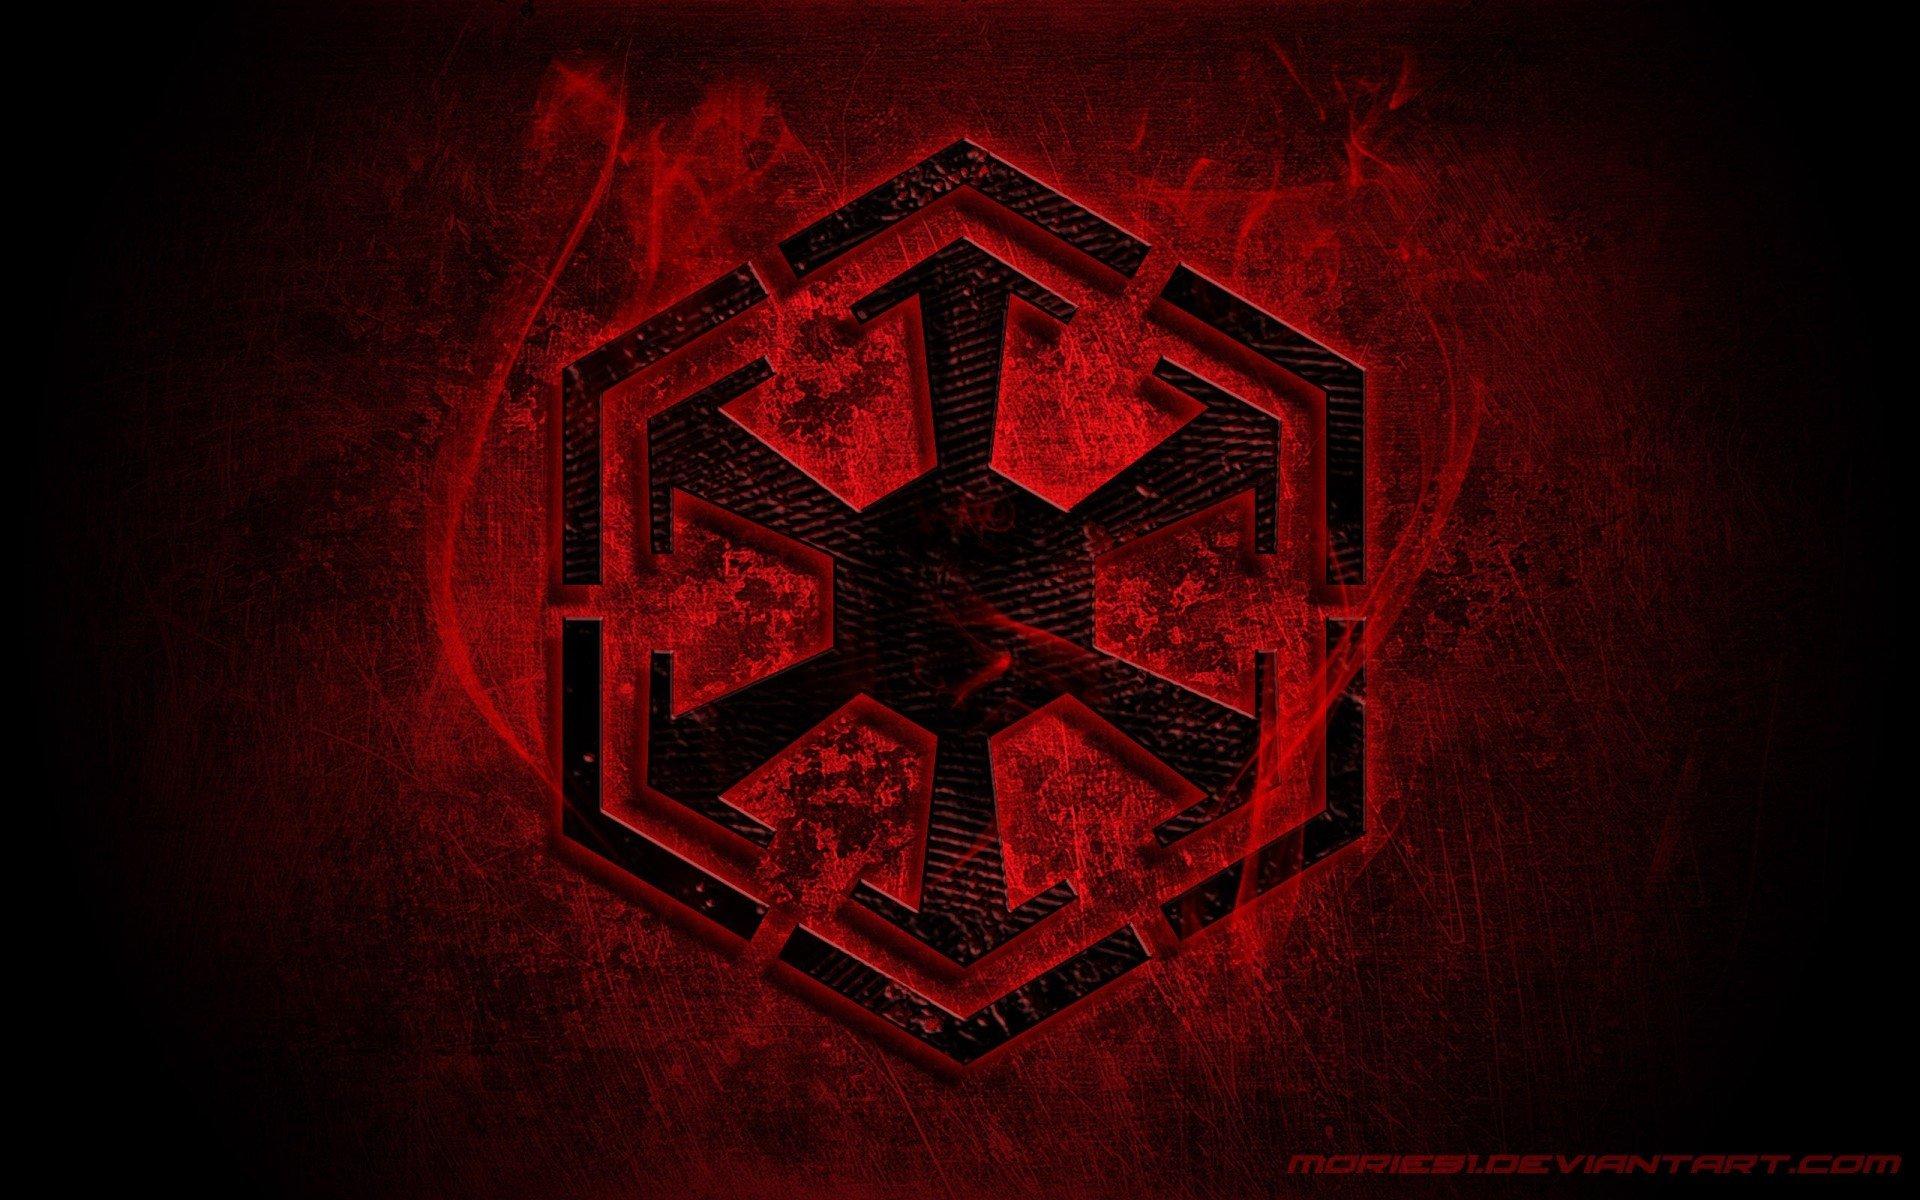 Star wars the old republic Sith logo wallpaper 1920x1200 590331 1920x1200